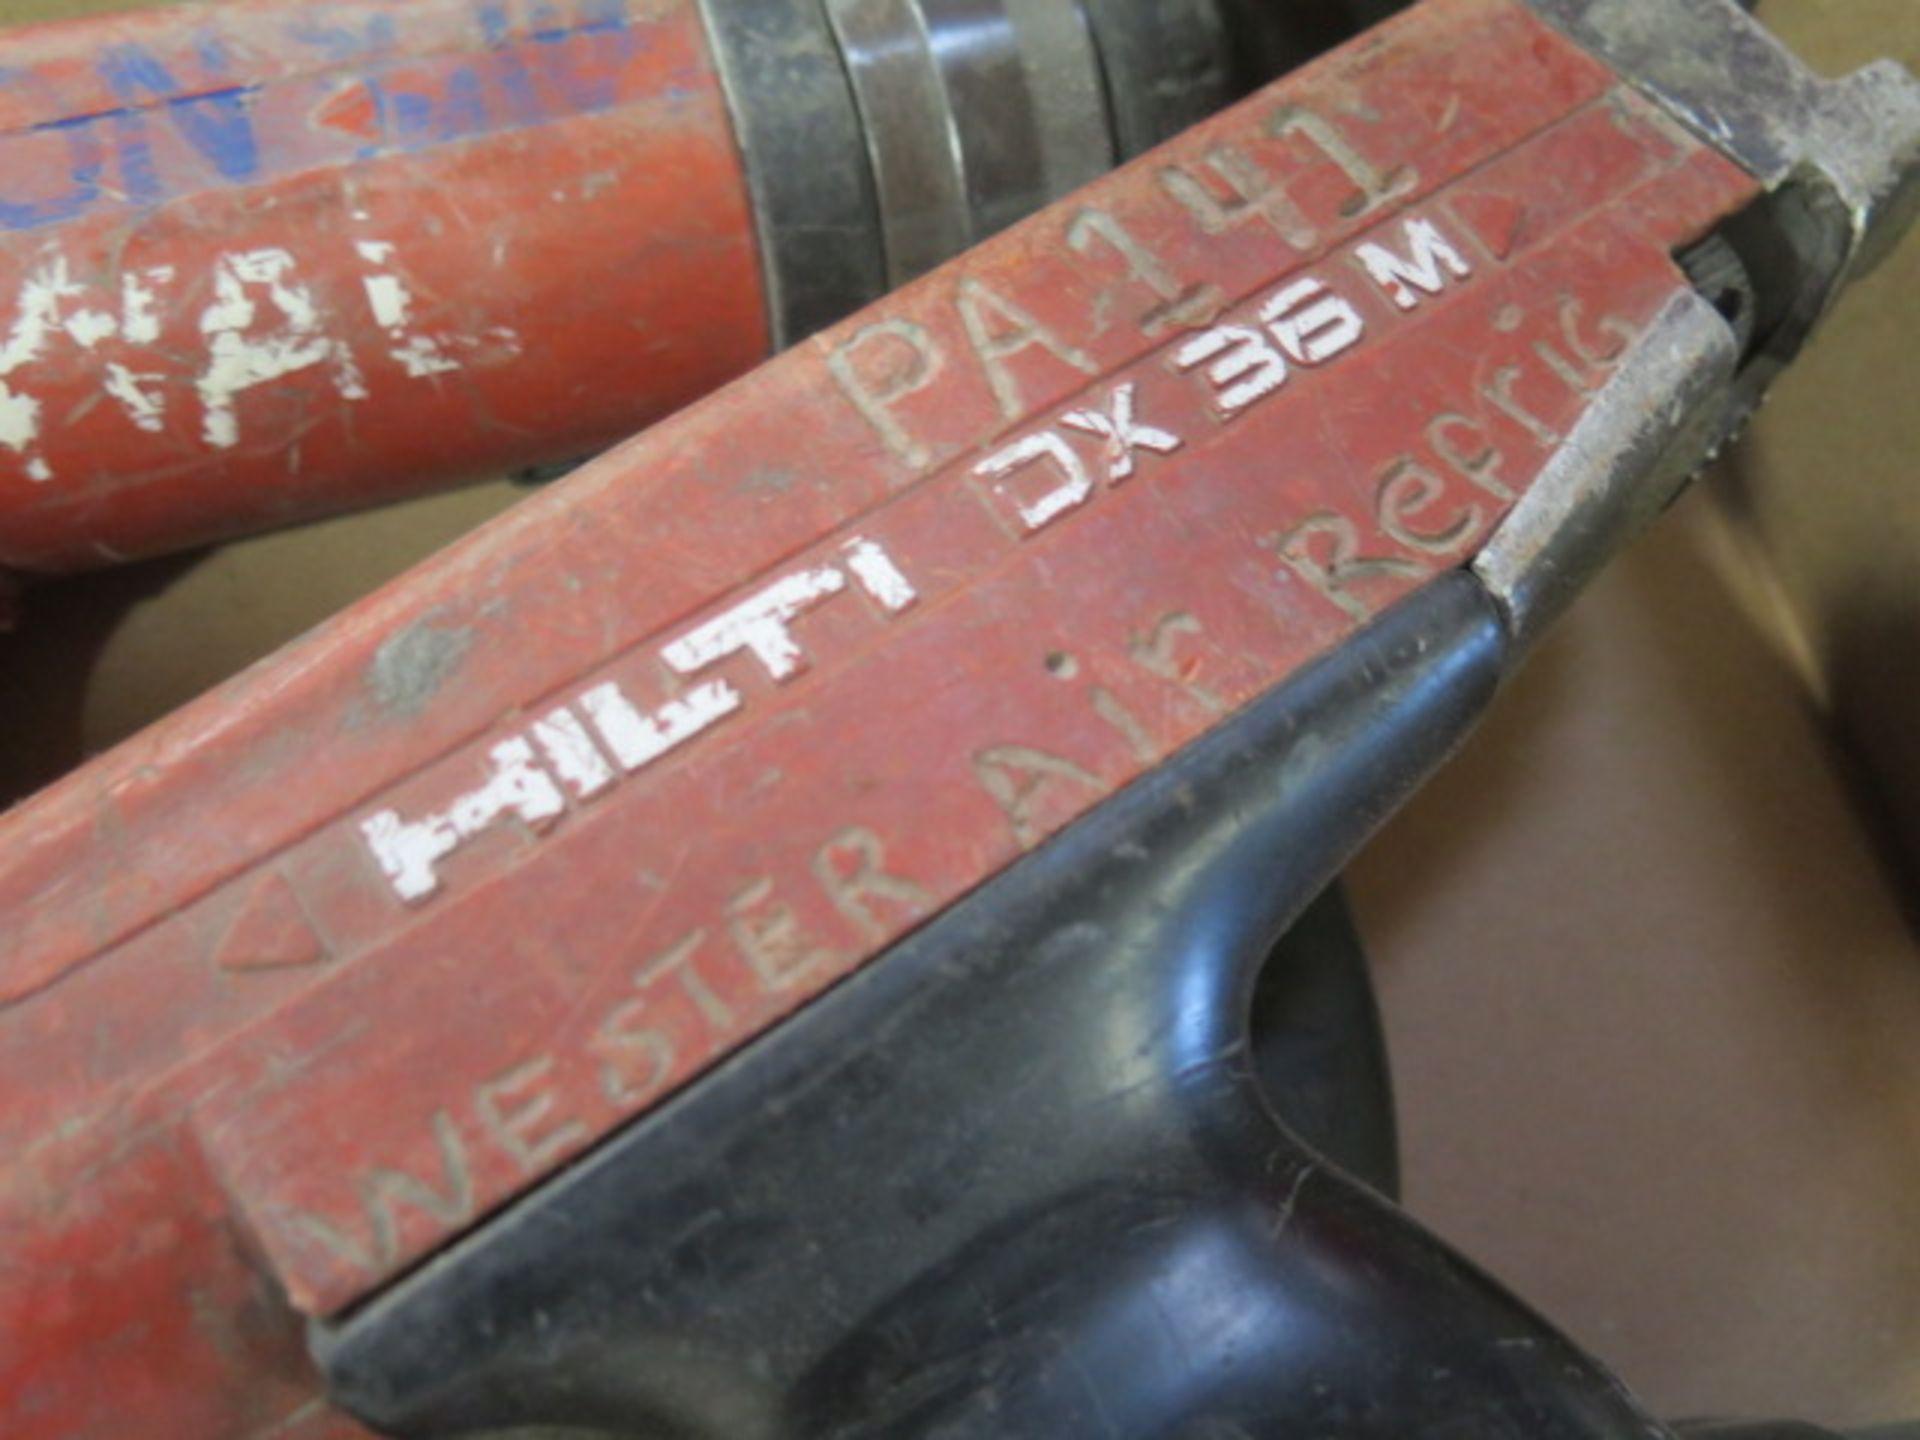 Hilti DX36 Powder Shot Guns (3) (SOLD AS-IS - NO WARRANTY) - Image 4 of 4